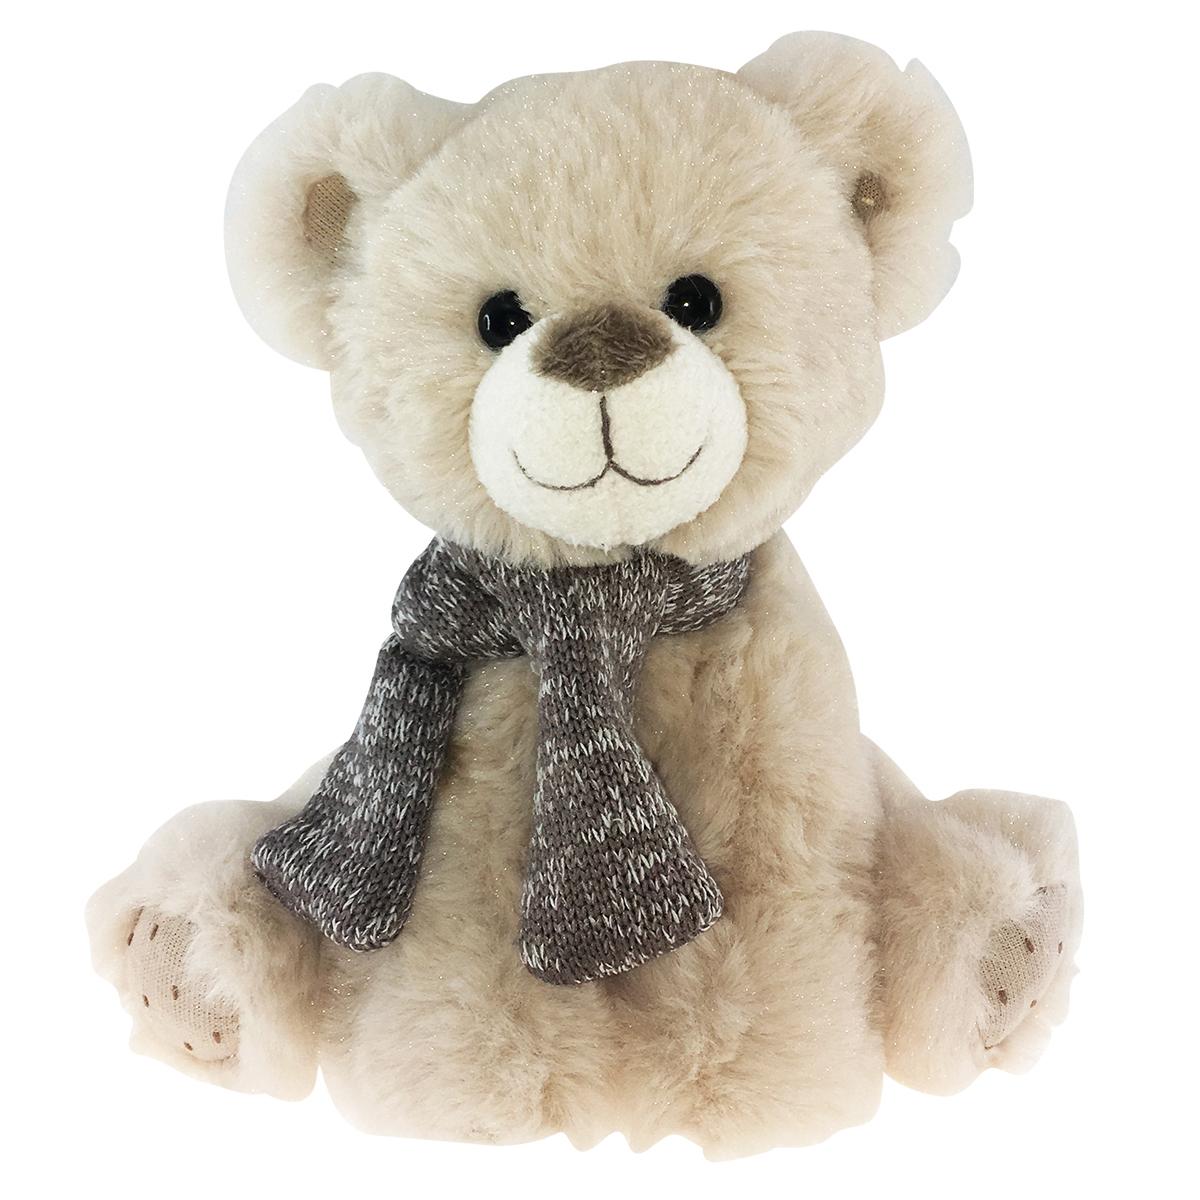 Peluche design \'Teddy Bear\' beige taupe - 35 cm - [Q3911]